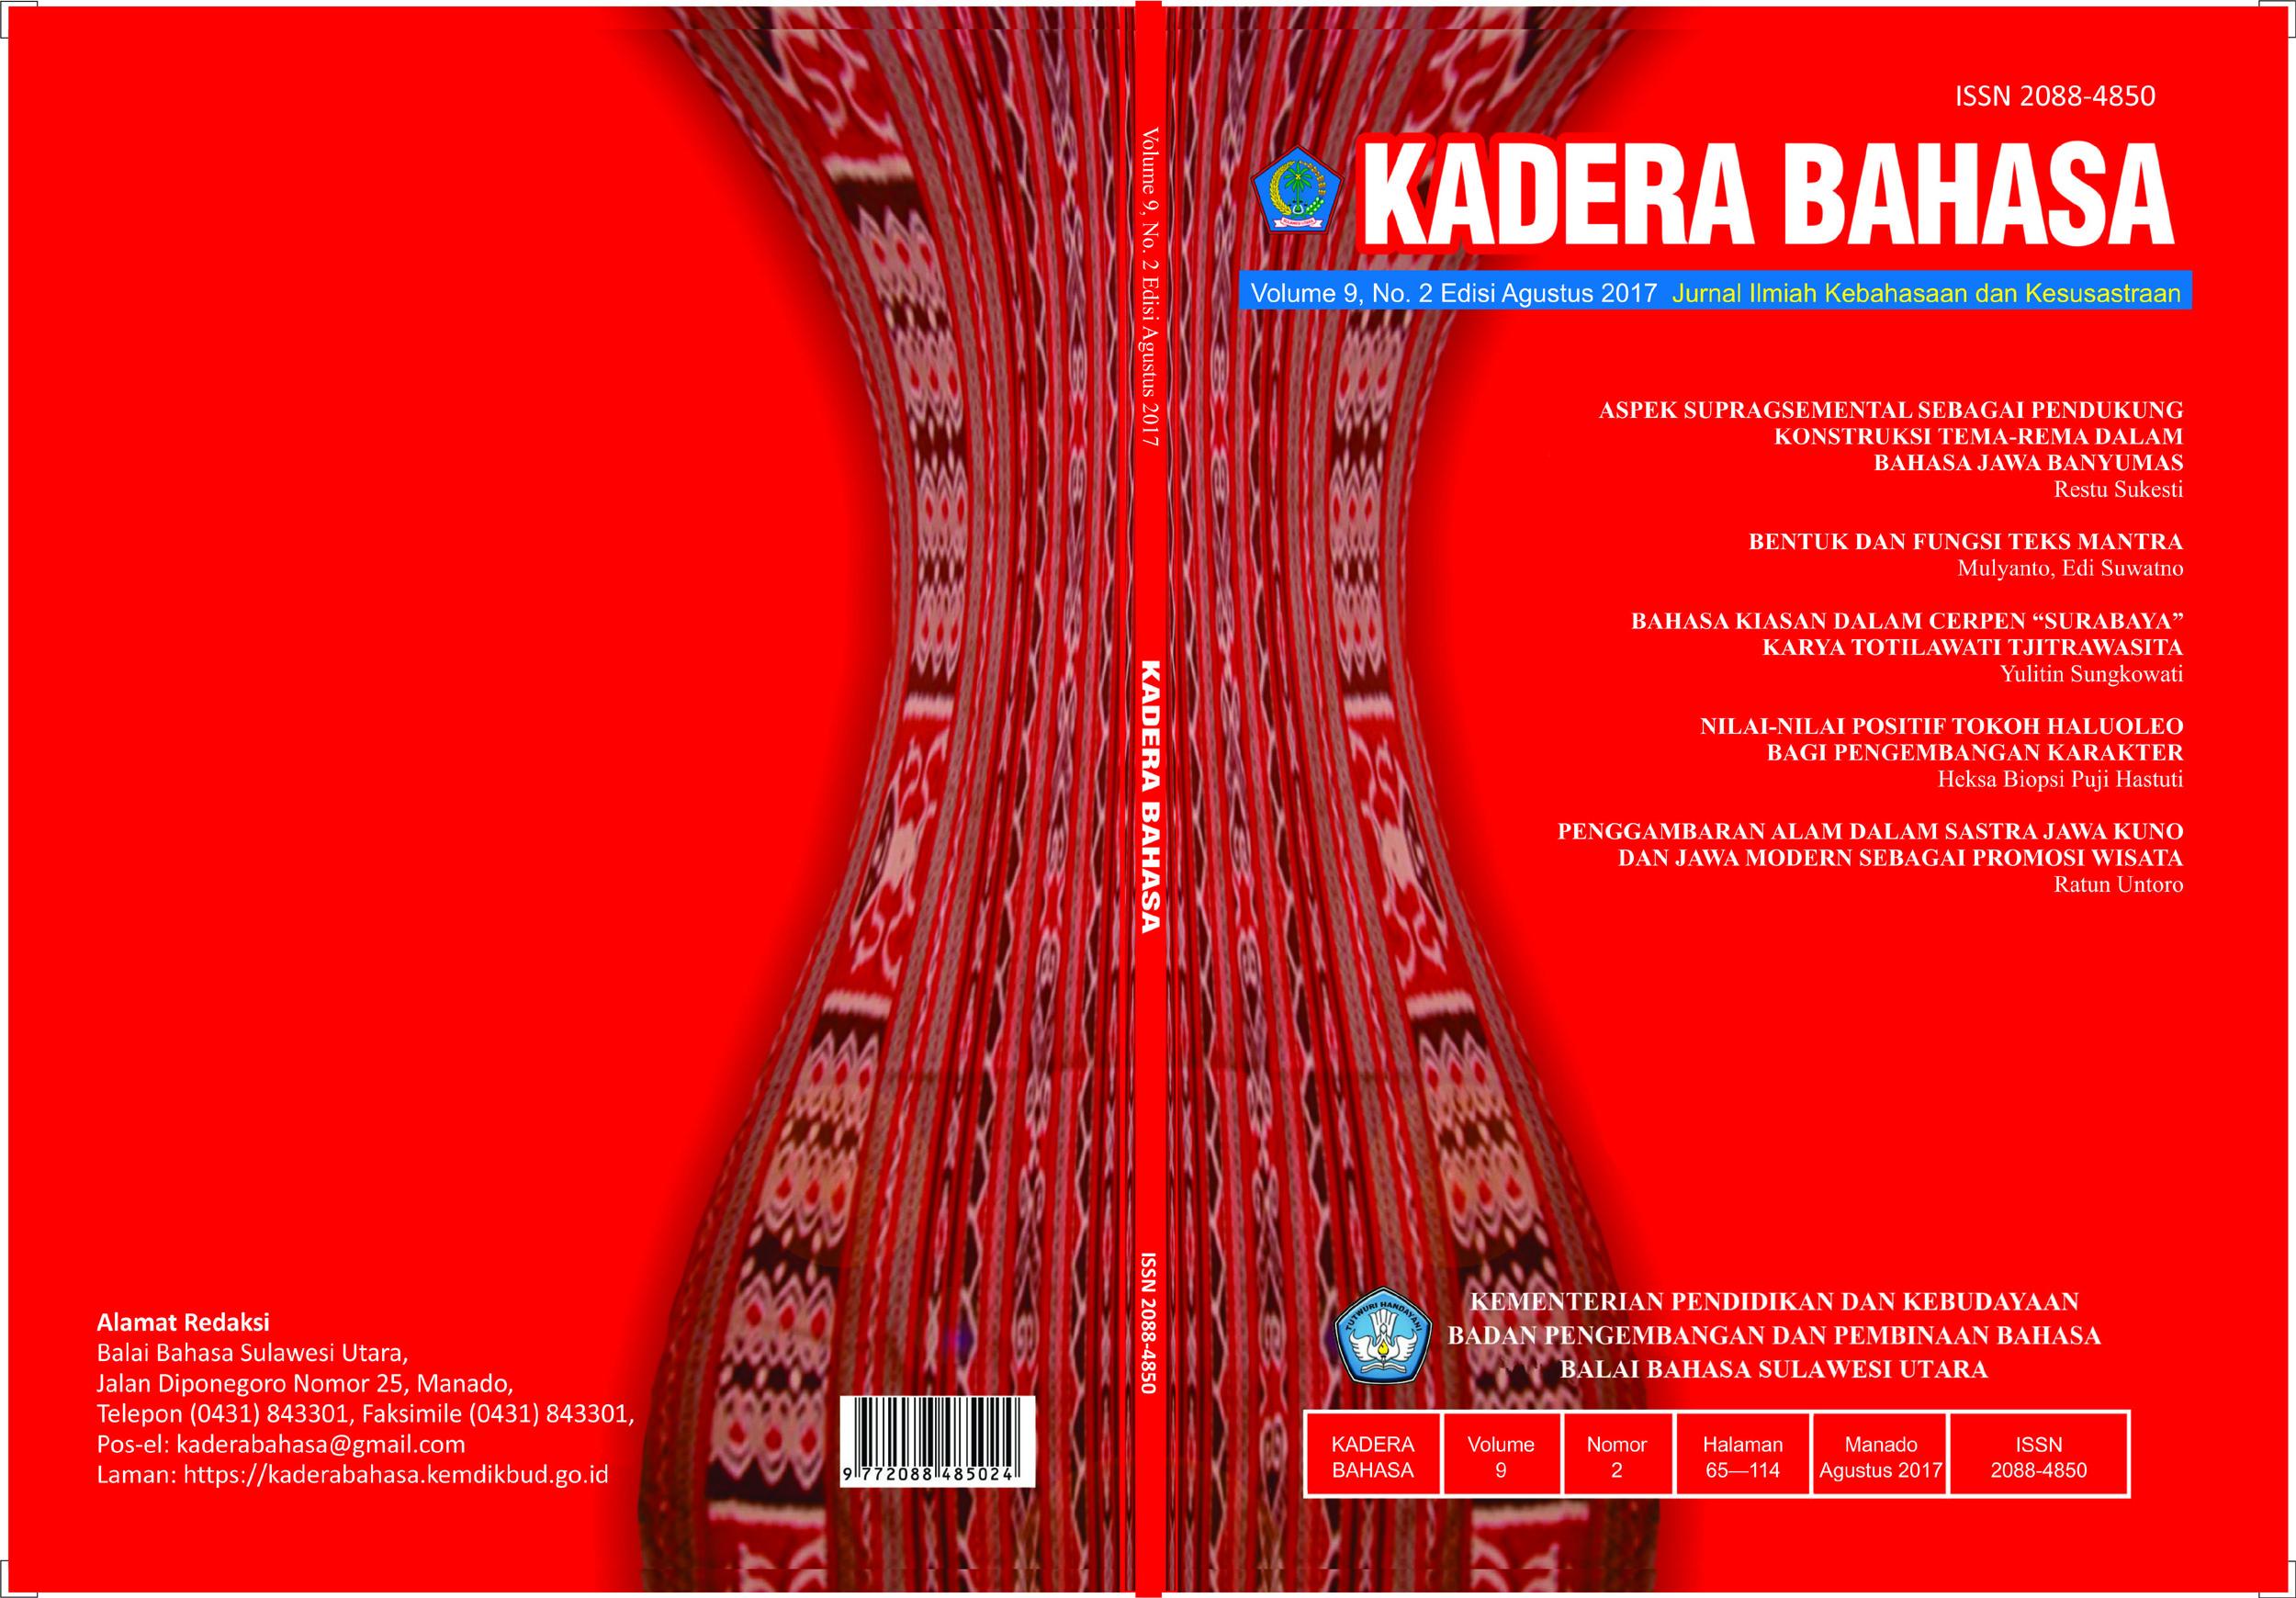 Kadera Bahasa Volume 9 Nomor 2 Edisi Agustus 2017